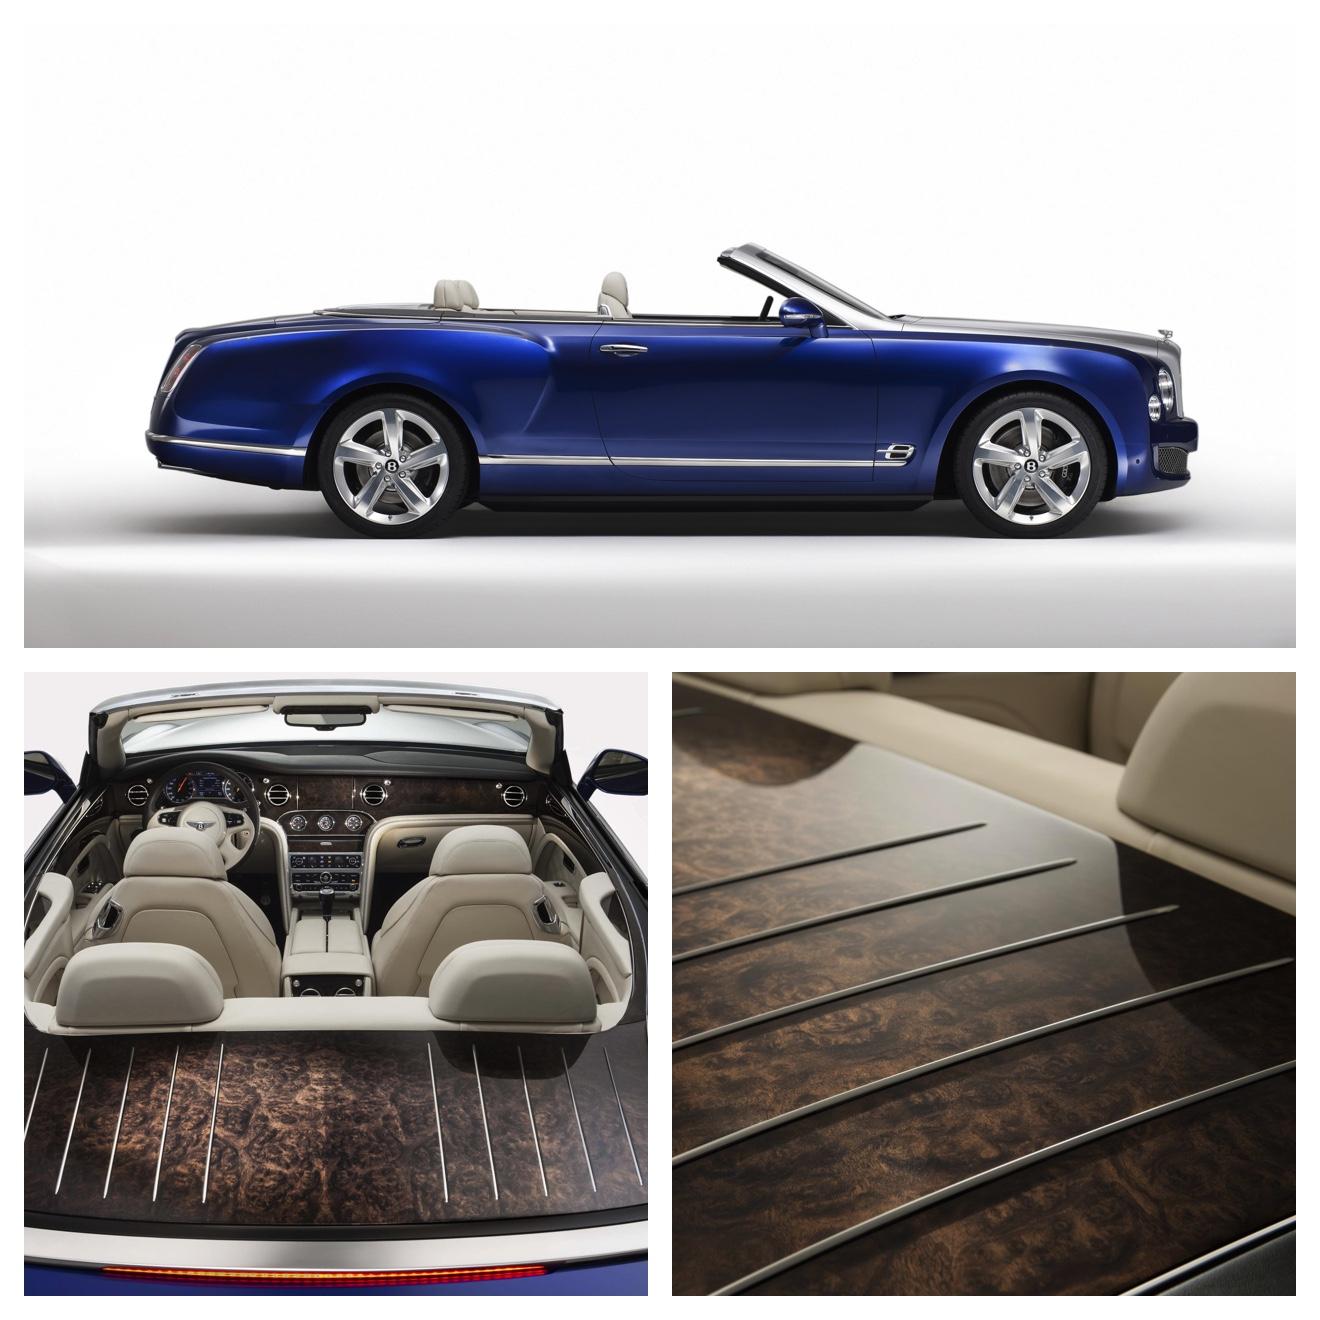 Bentley Convertible Car: New Bentley Grand Convertible / Mulsanne Convertible